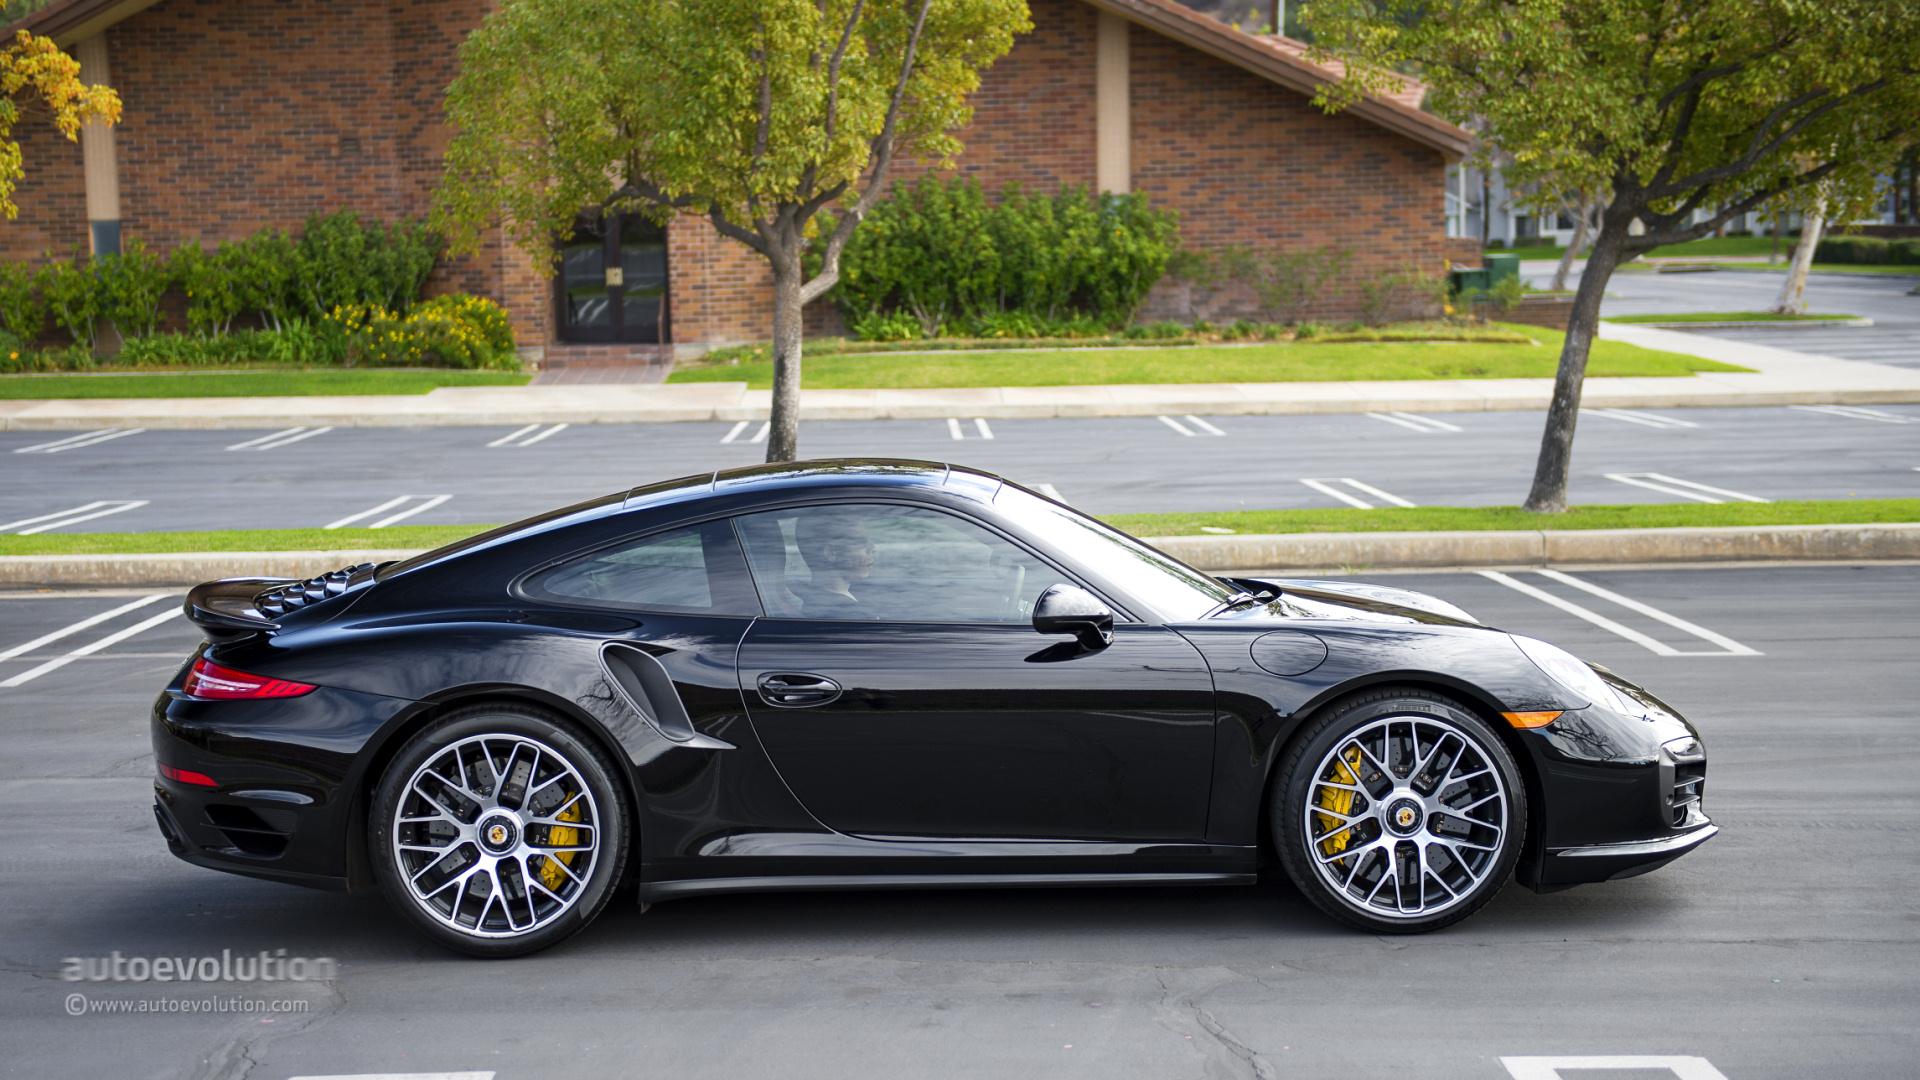 2014-porsche-911-turbo-s-review-2014_55.jpg